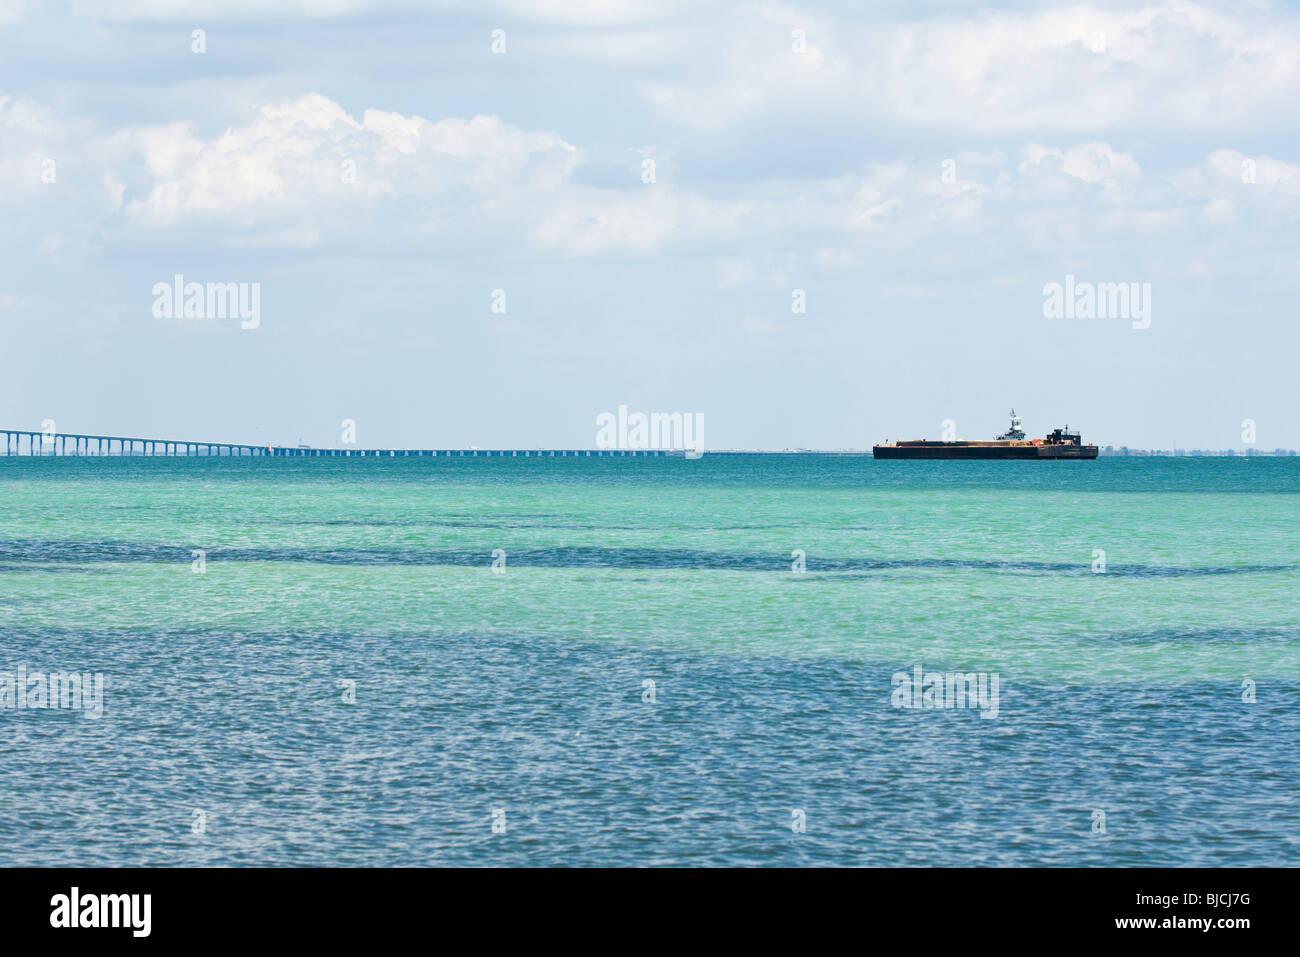 Seascape with barge on horizon - Stock Image